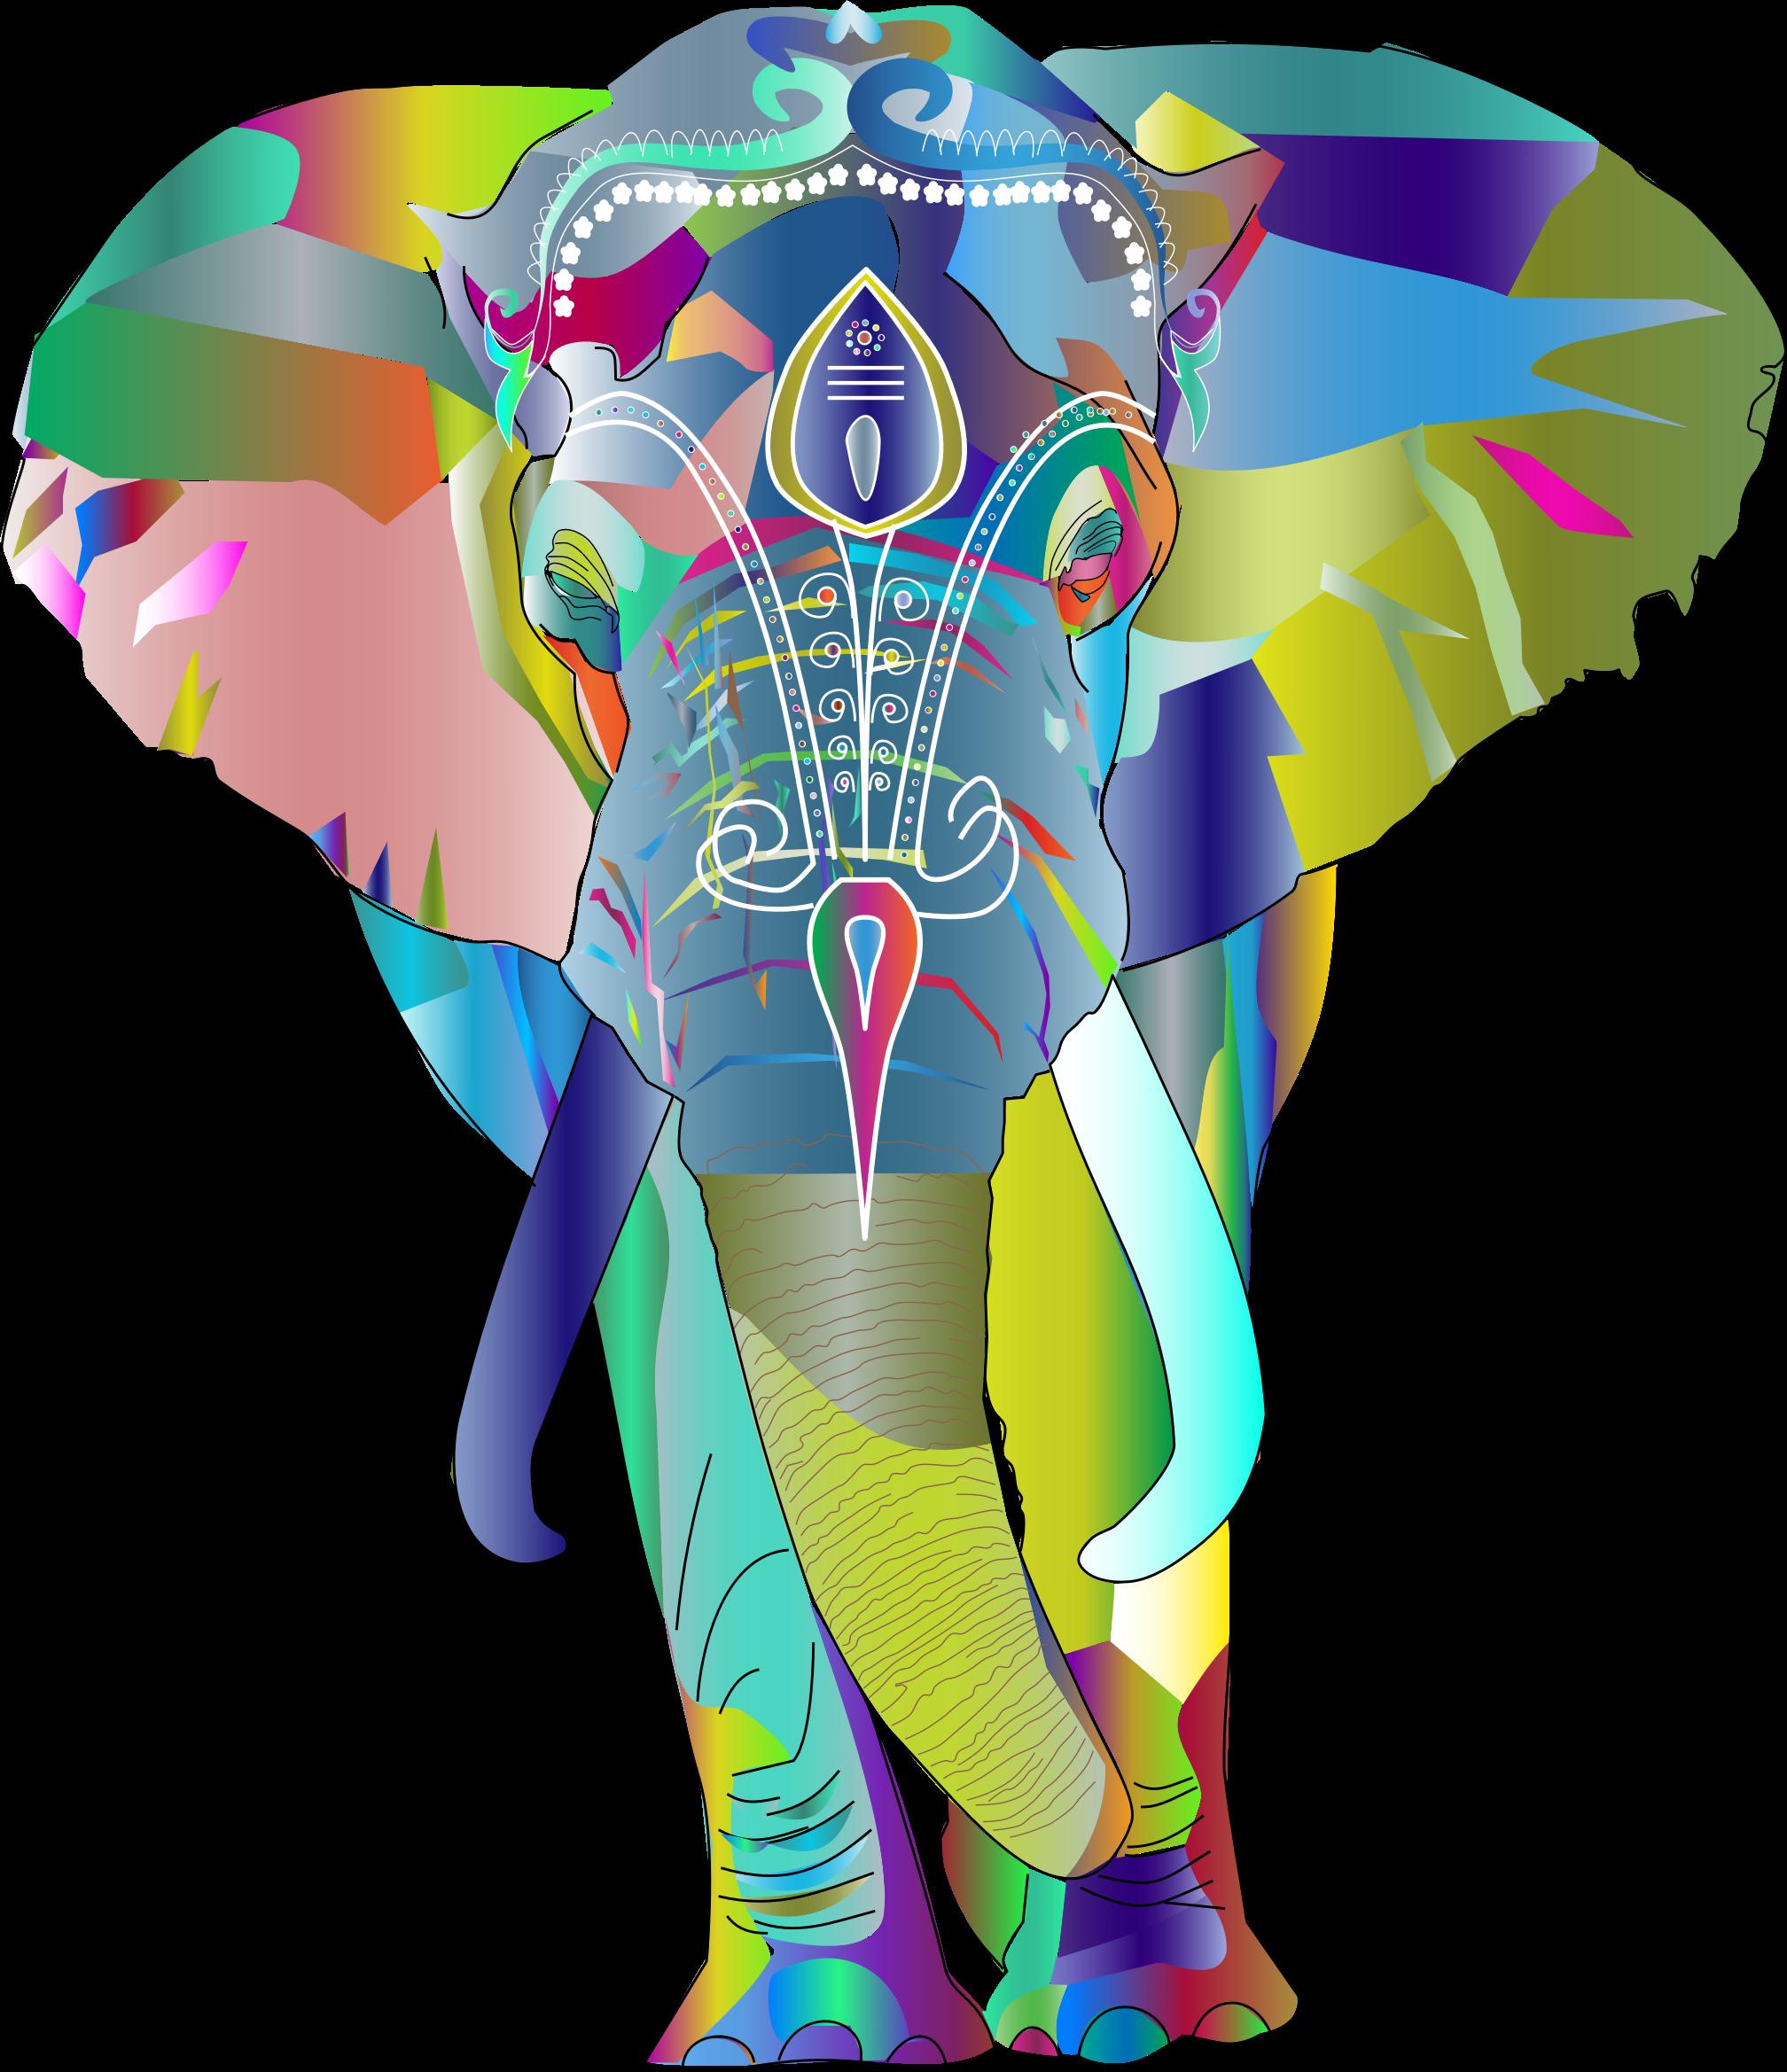 Prismatic big image png. Clipart elephant rainbow